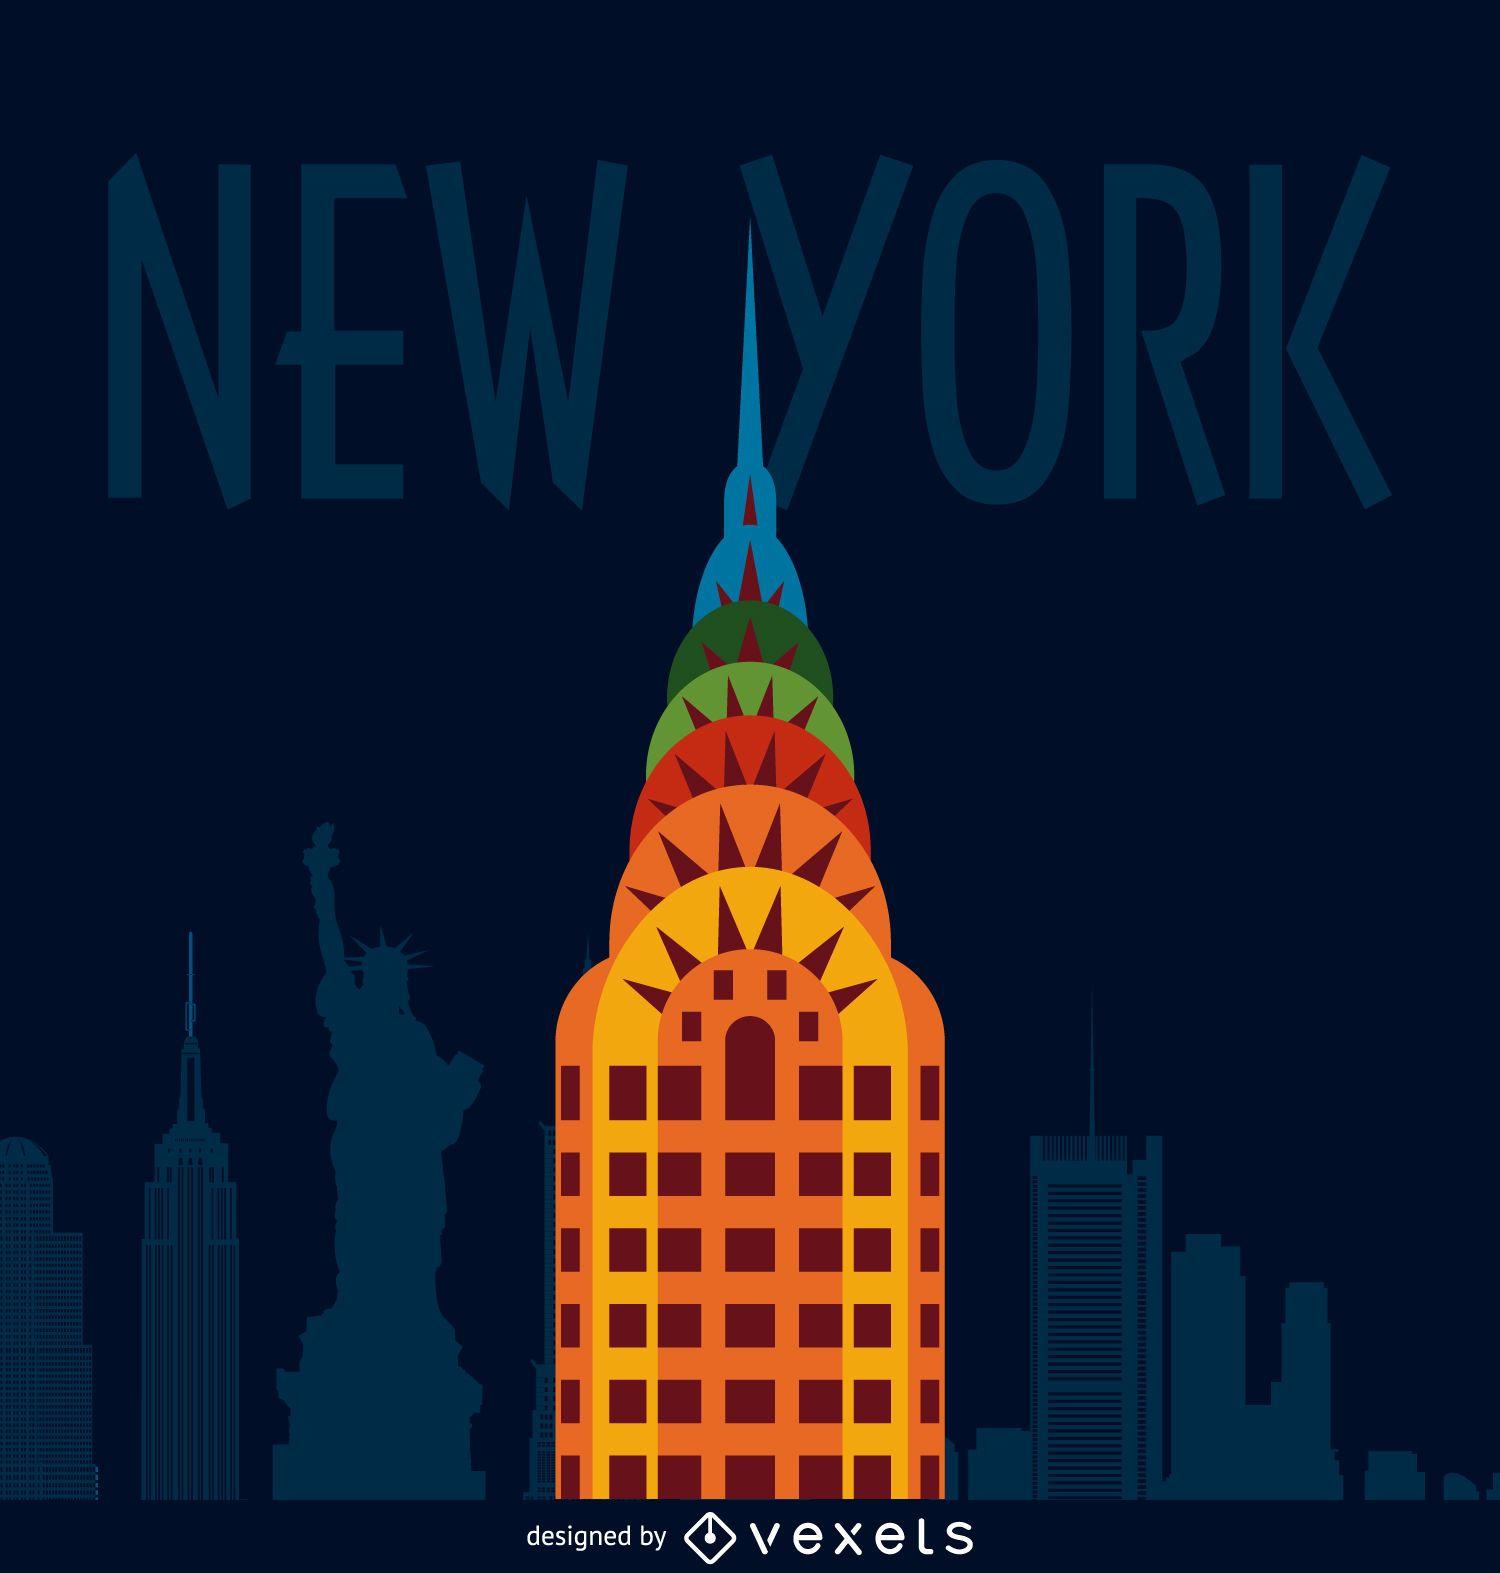 New York City illustration poster